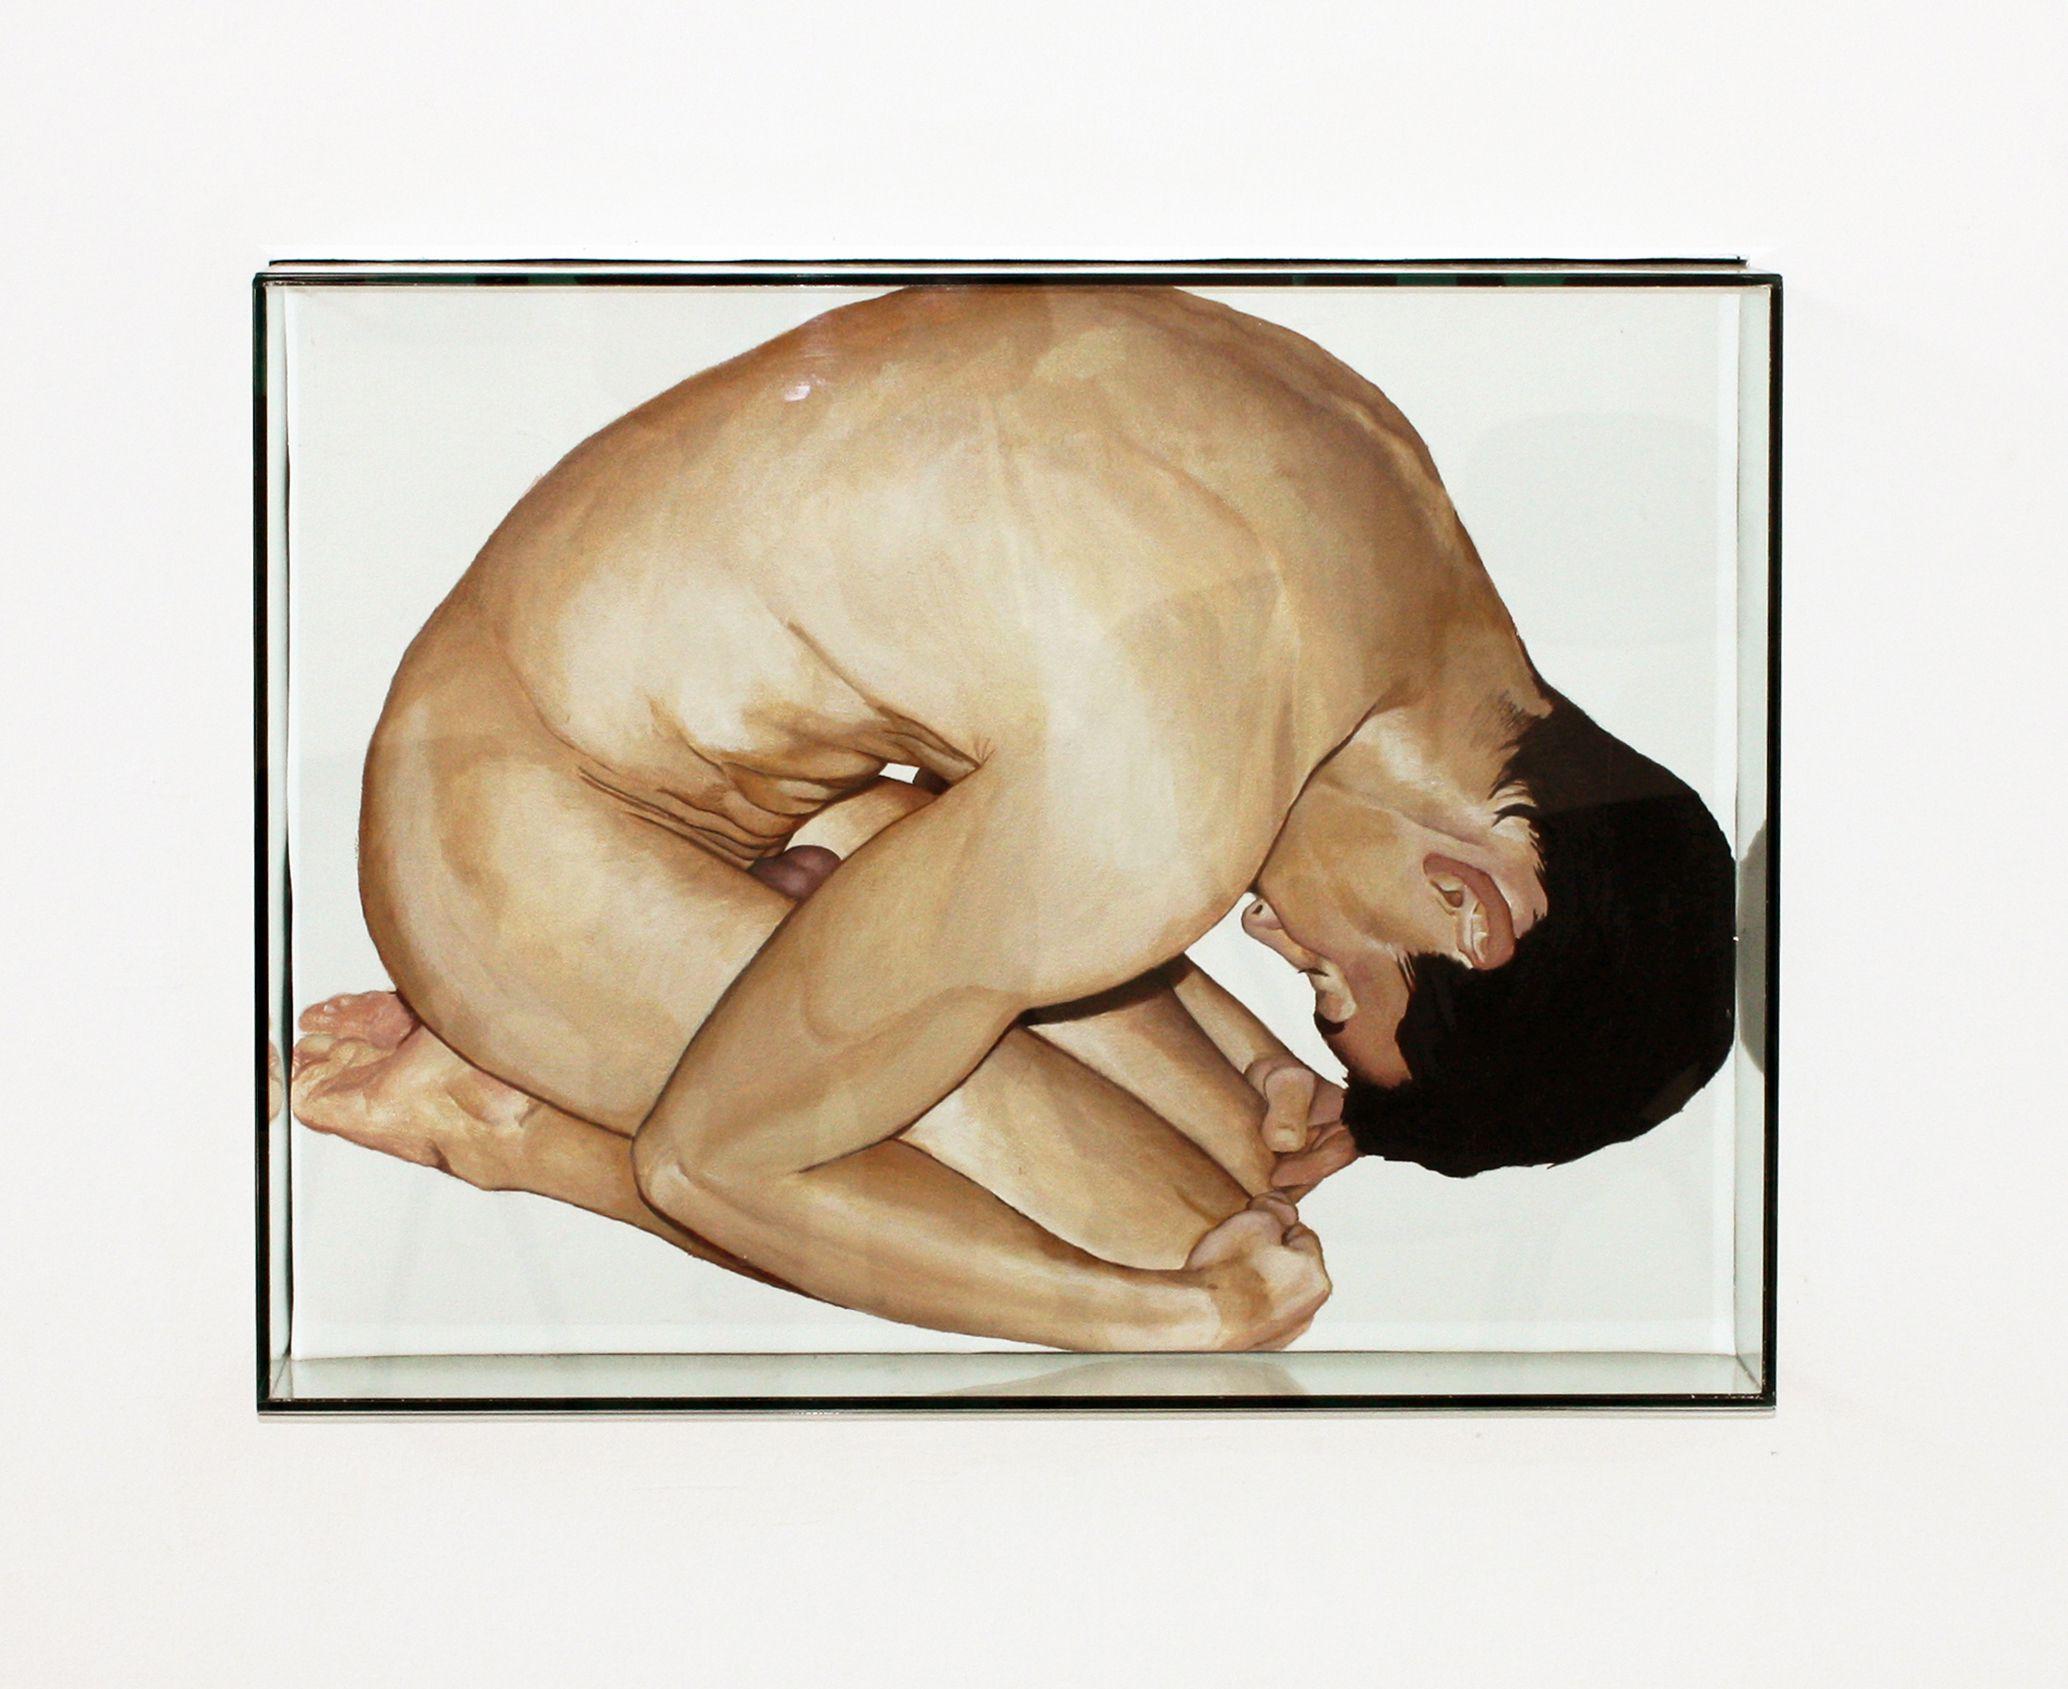 Claudia-art-gallery-Glass-box-acrylic-on-canvas-1